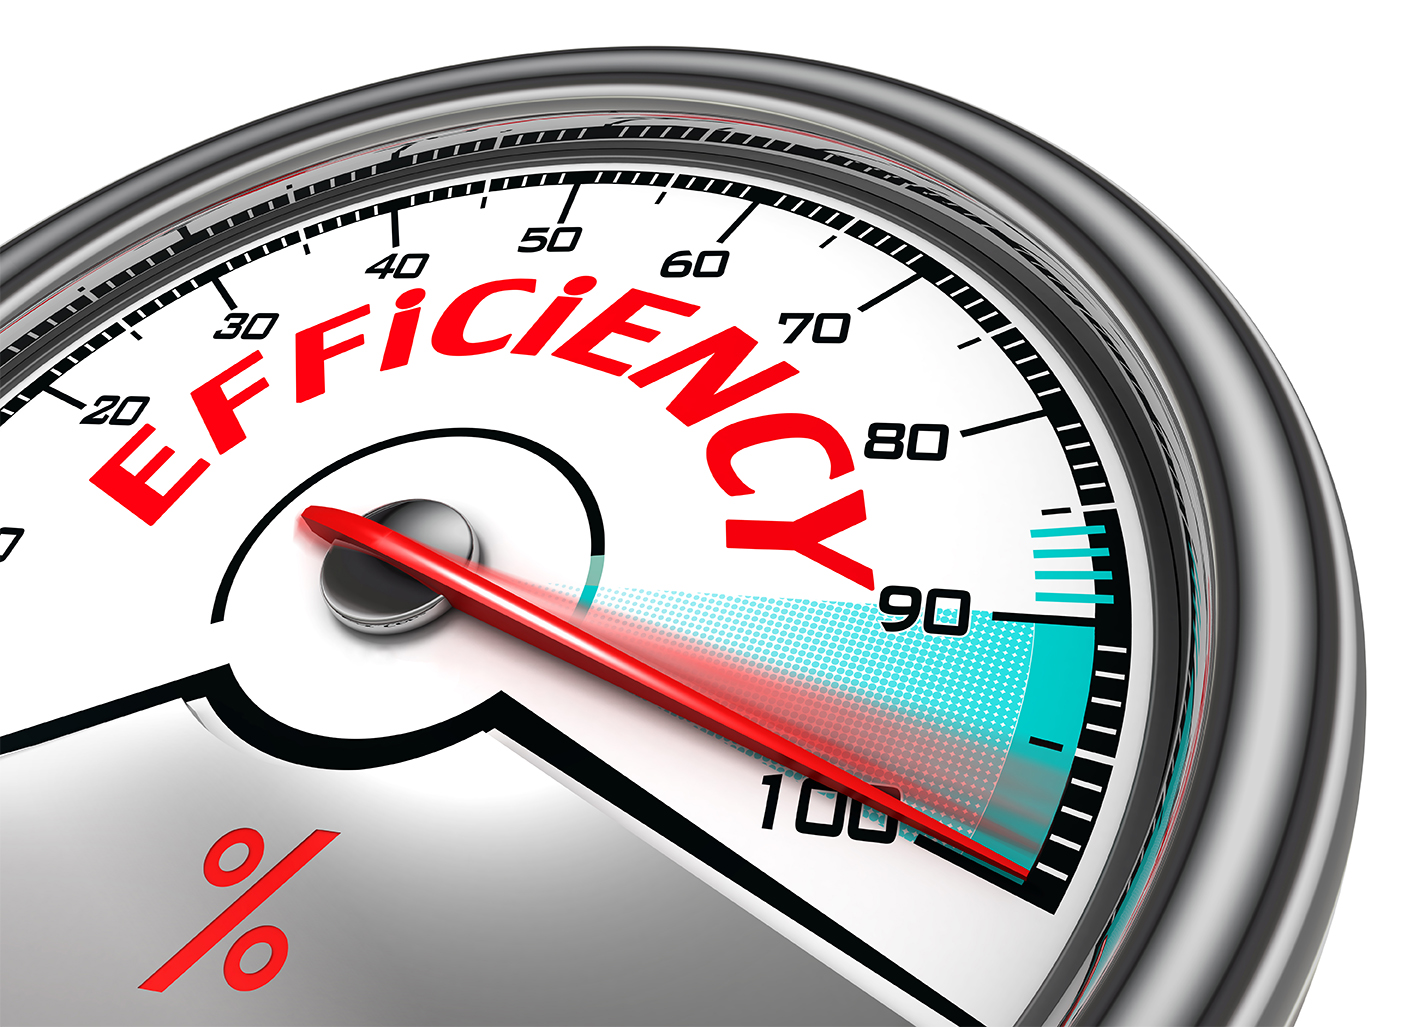 bigstock-Efficiency-Level-Conceptual-Me-45285301